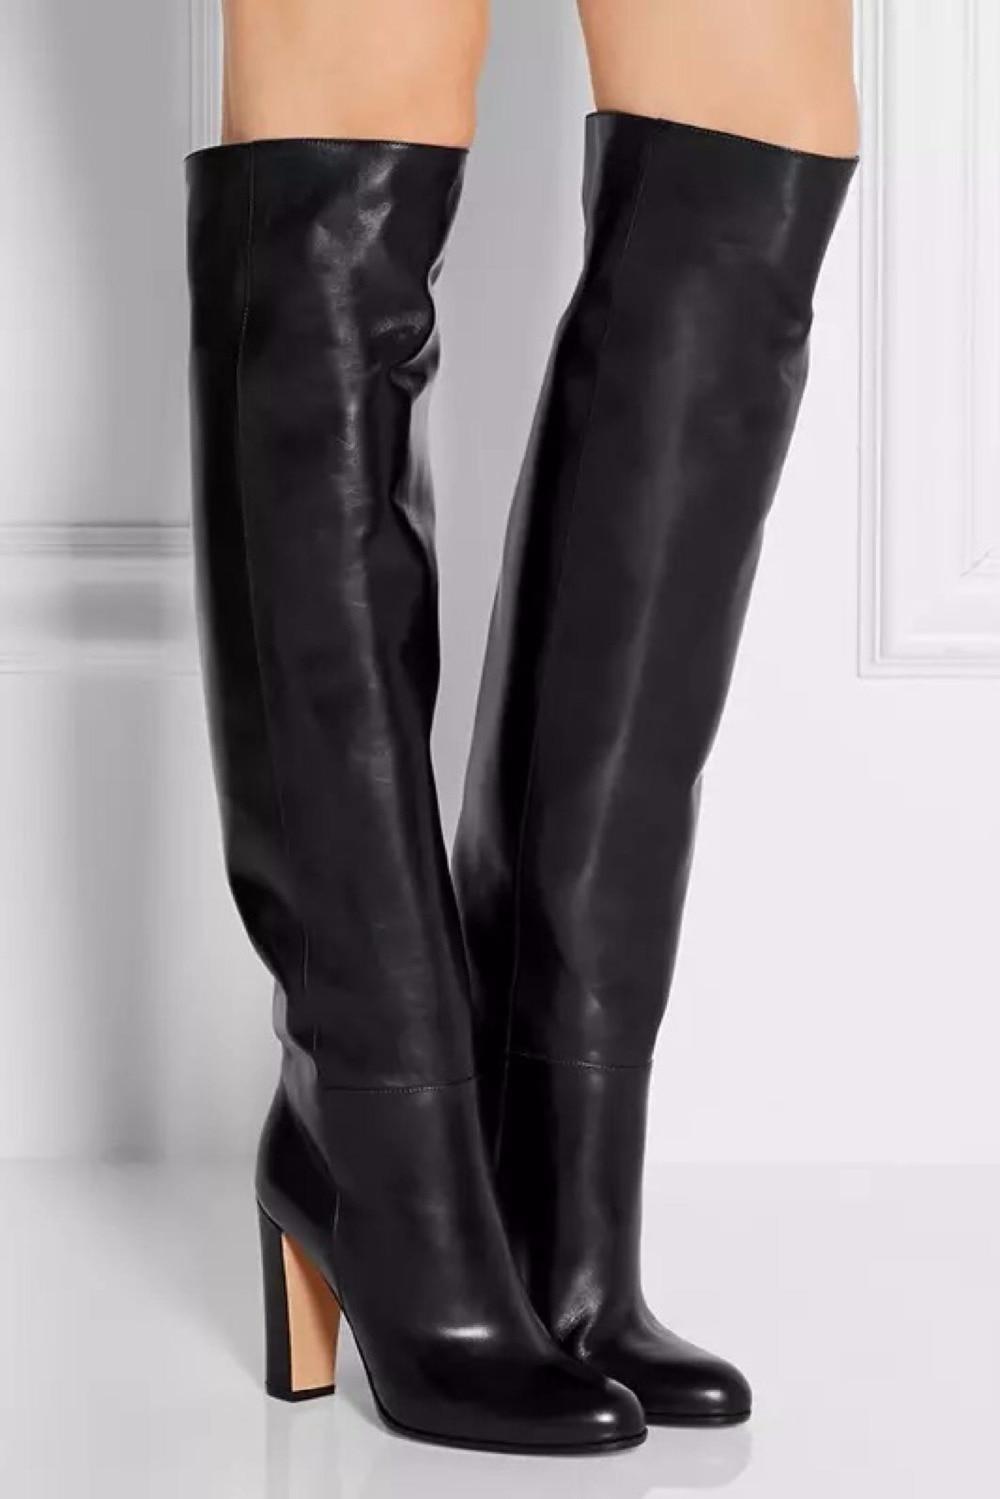 Fashion Autumn Winter Luxury Women 10 Cm High Heels Black Overknee Thigh High Boots Leather Stockings Punk Chaussure Femme